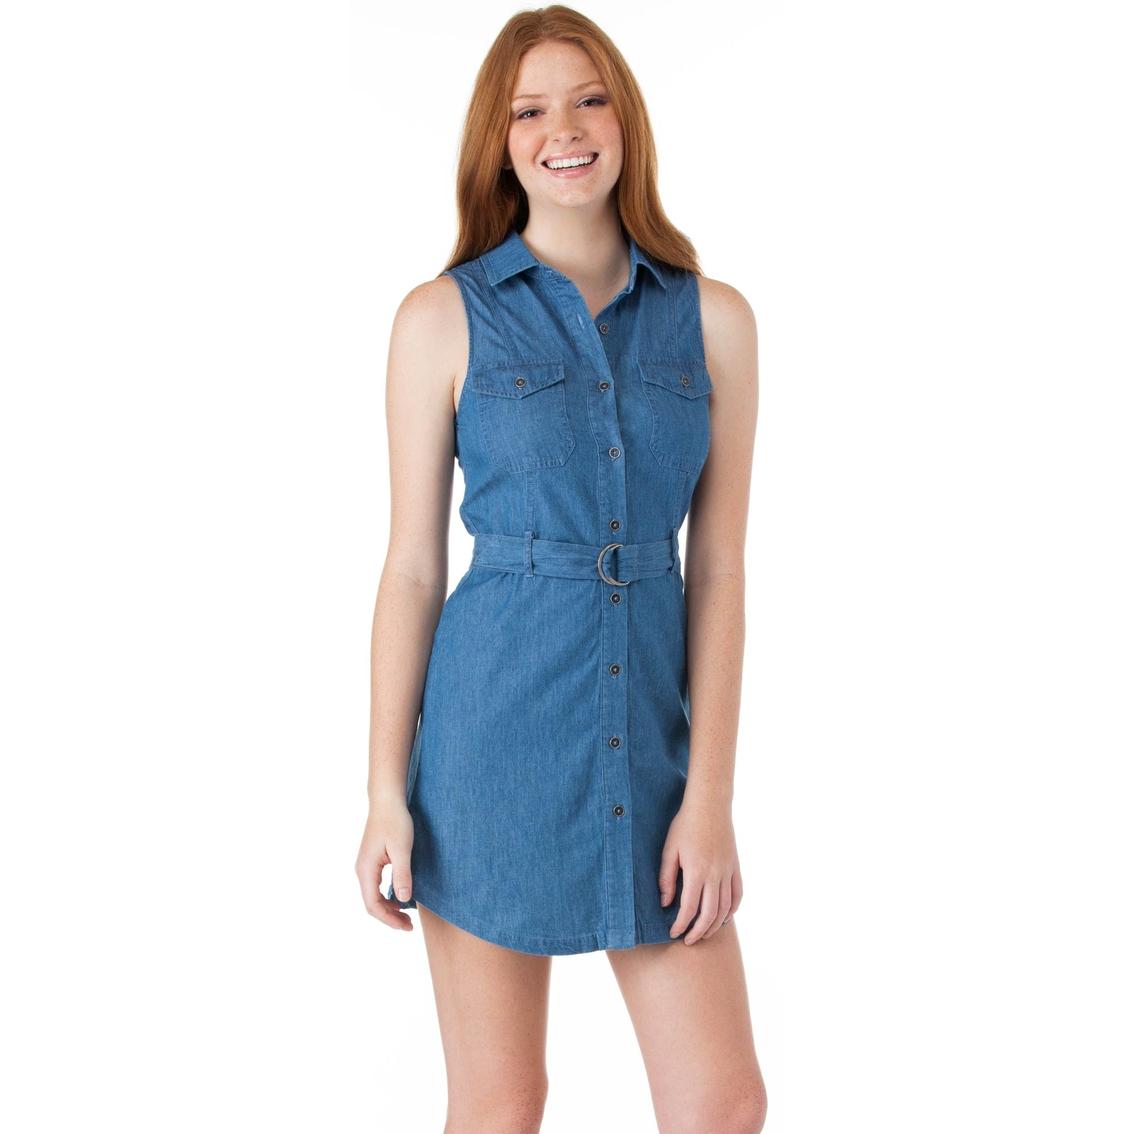 083aa81785d Denim Dresses For Juniors - Photo Dress Wallpaper HD AOrg